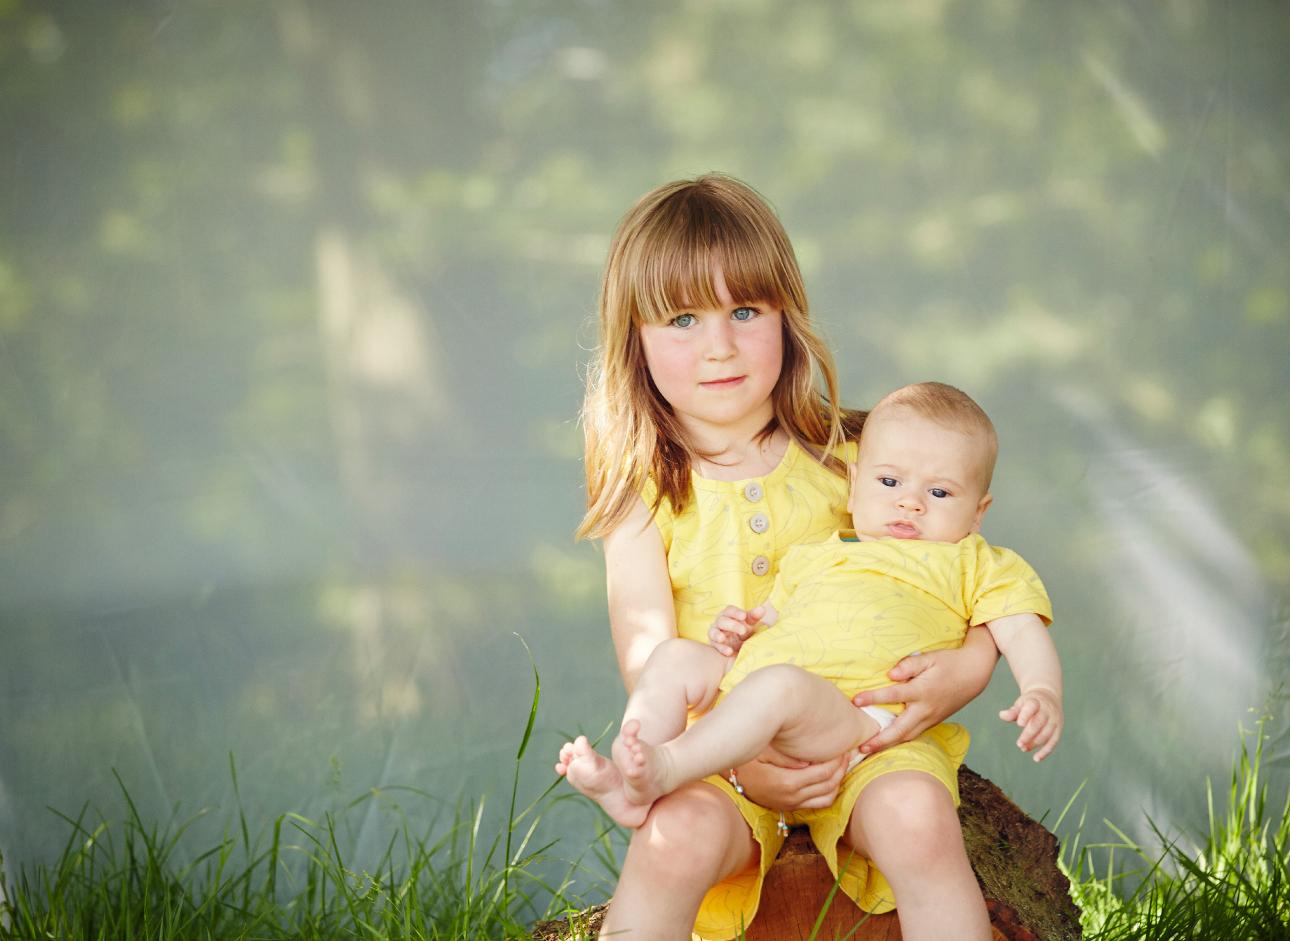 indikidual ss15 grote zus baby geel